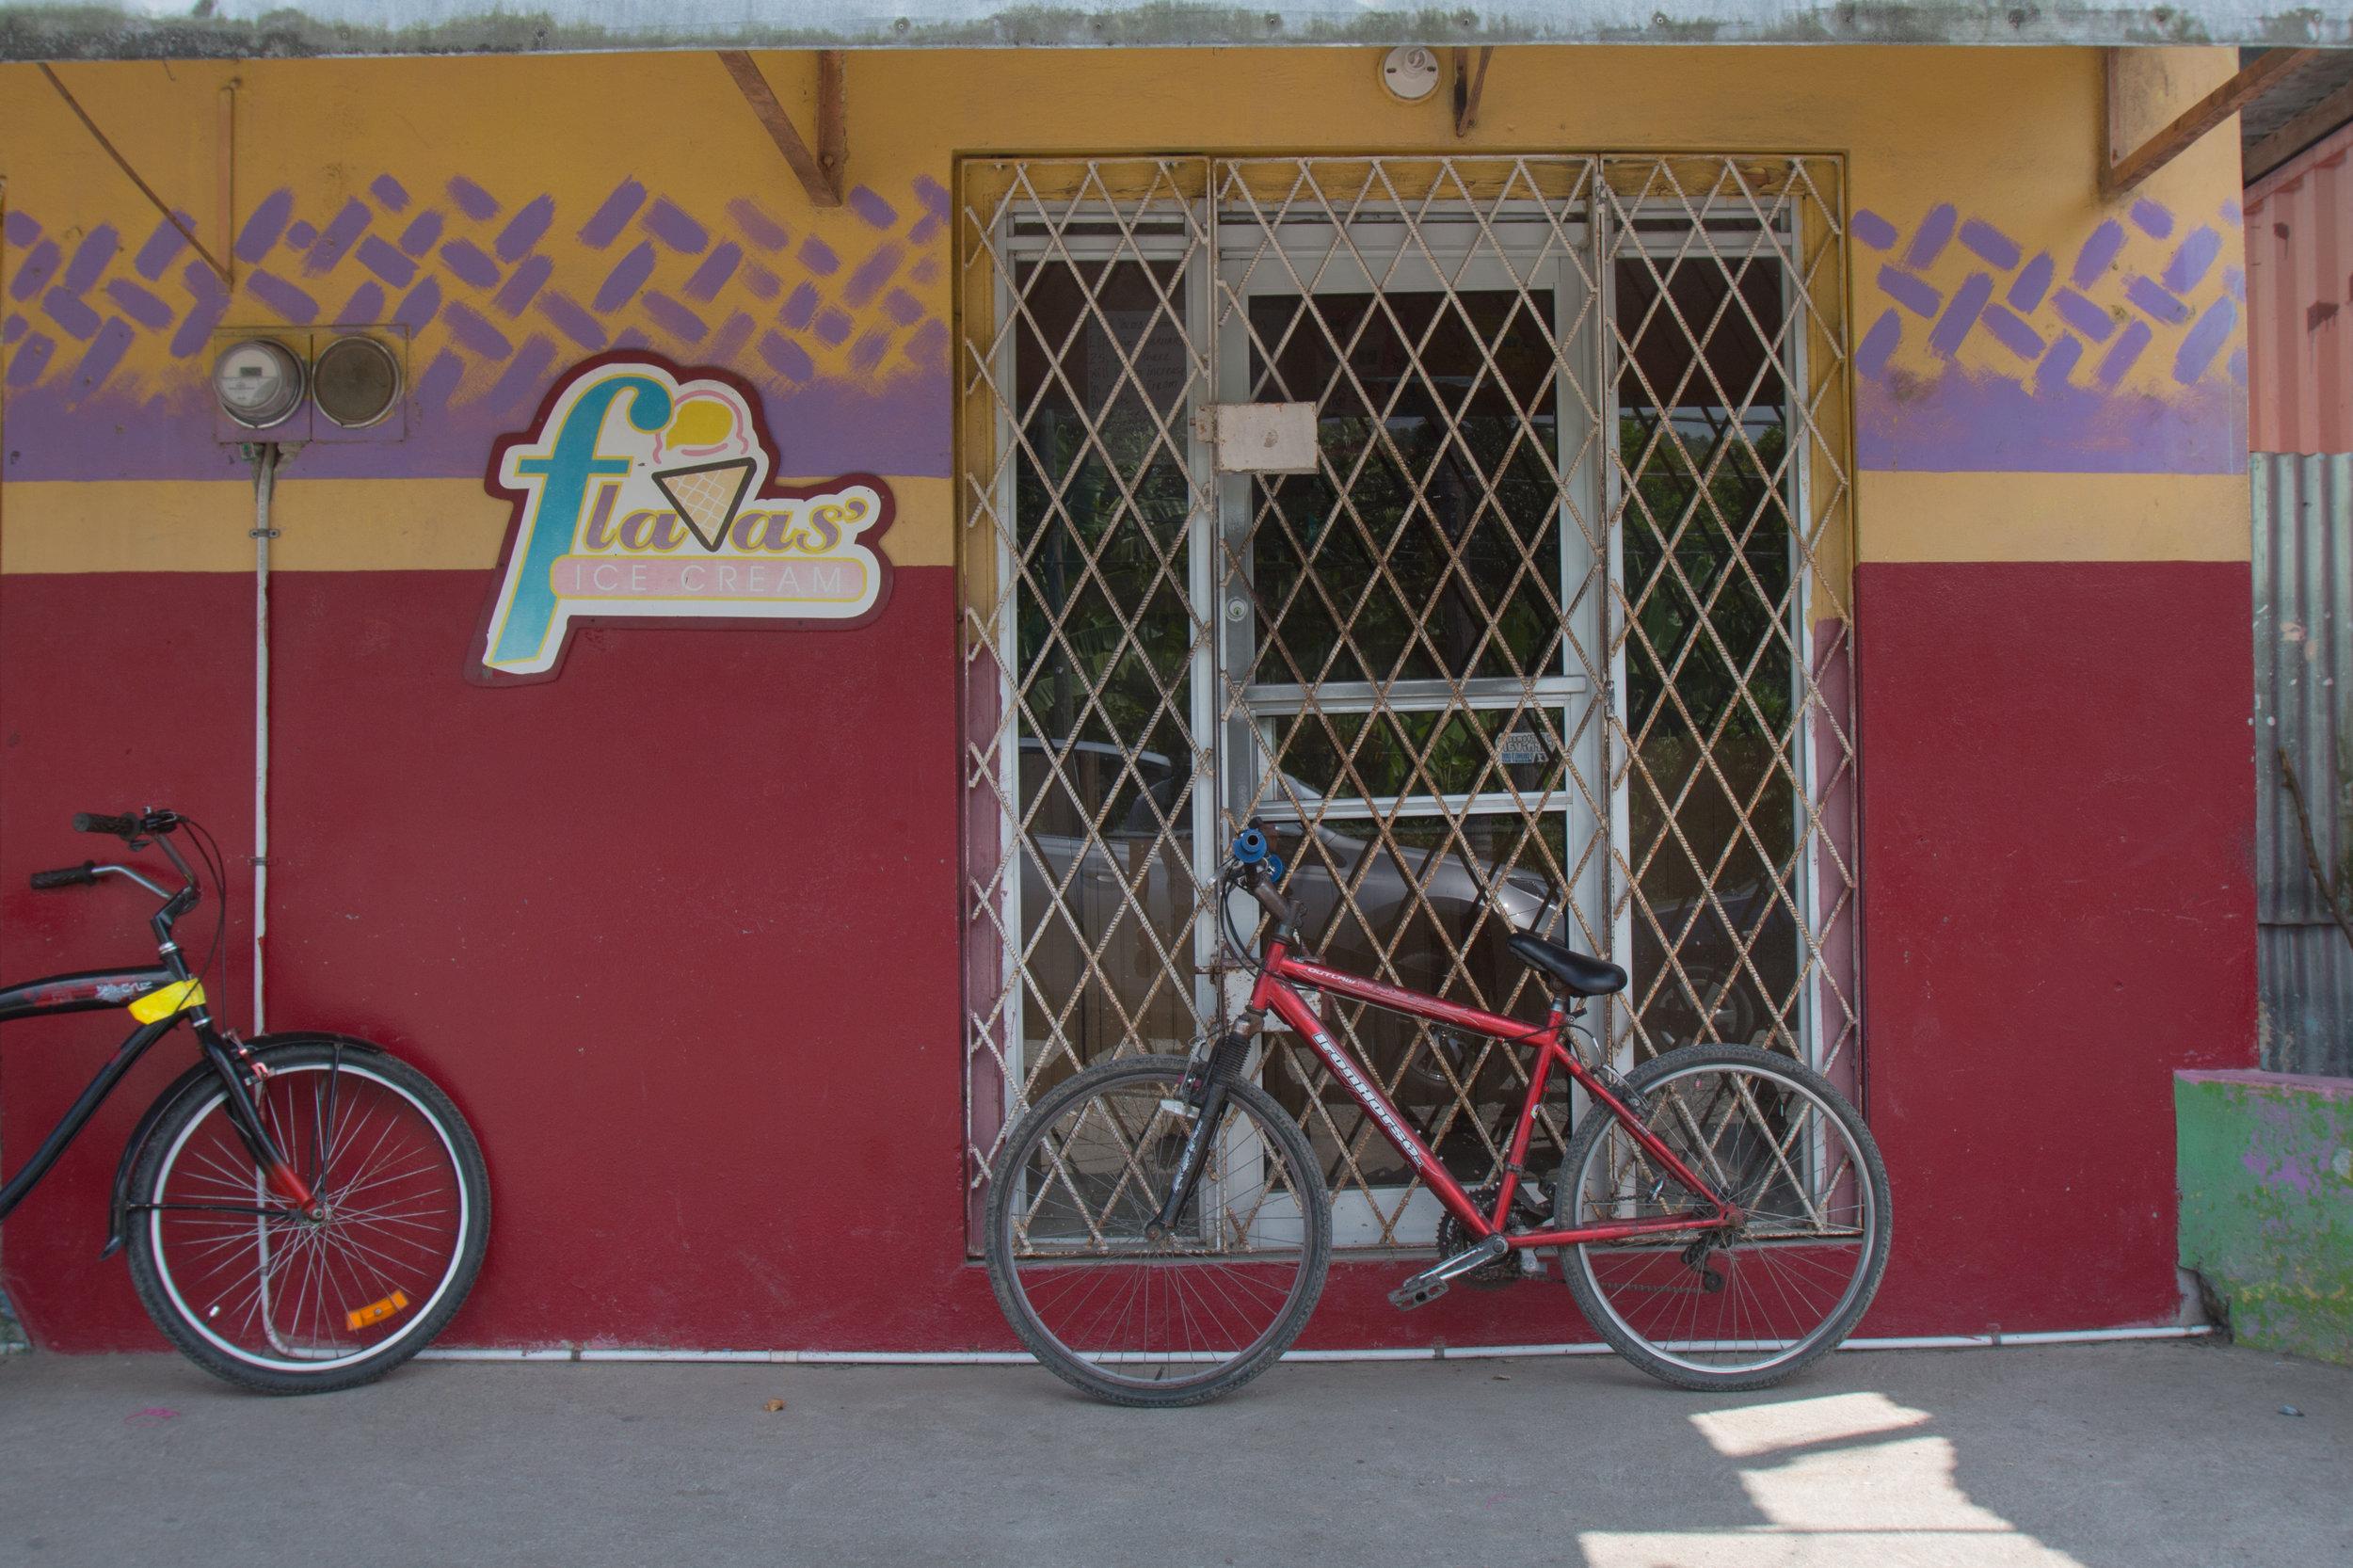 Jamaica edits for blog-15.jpg